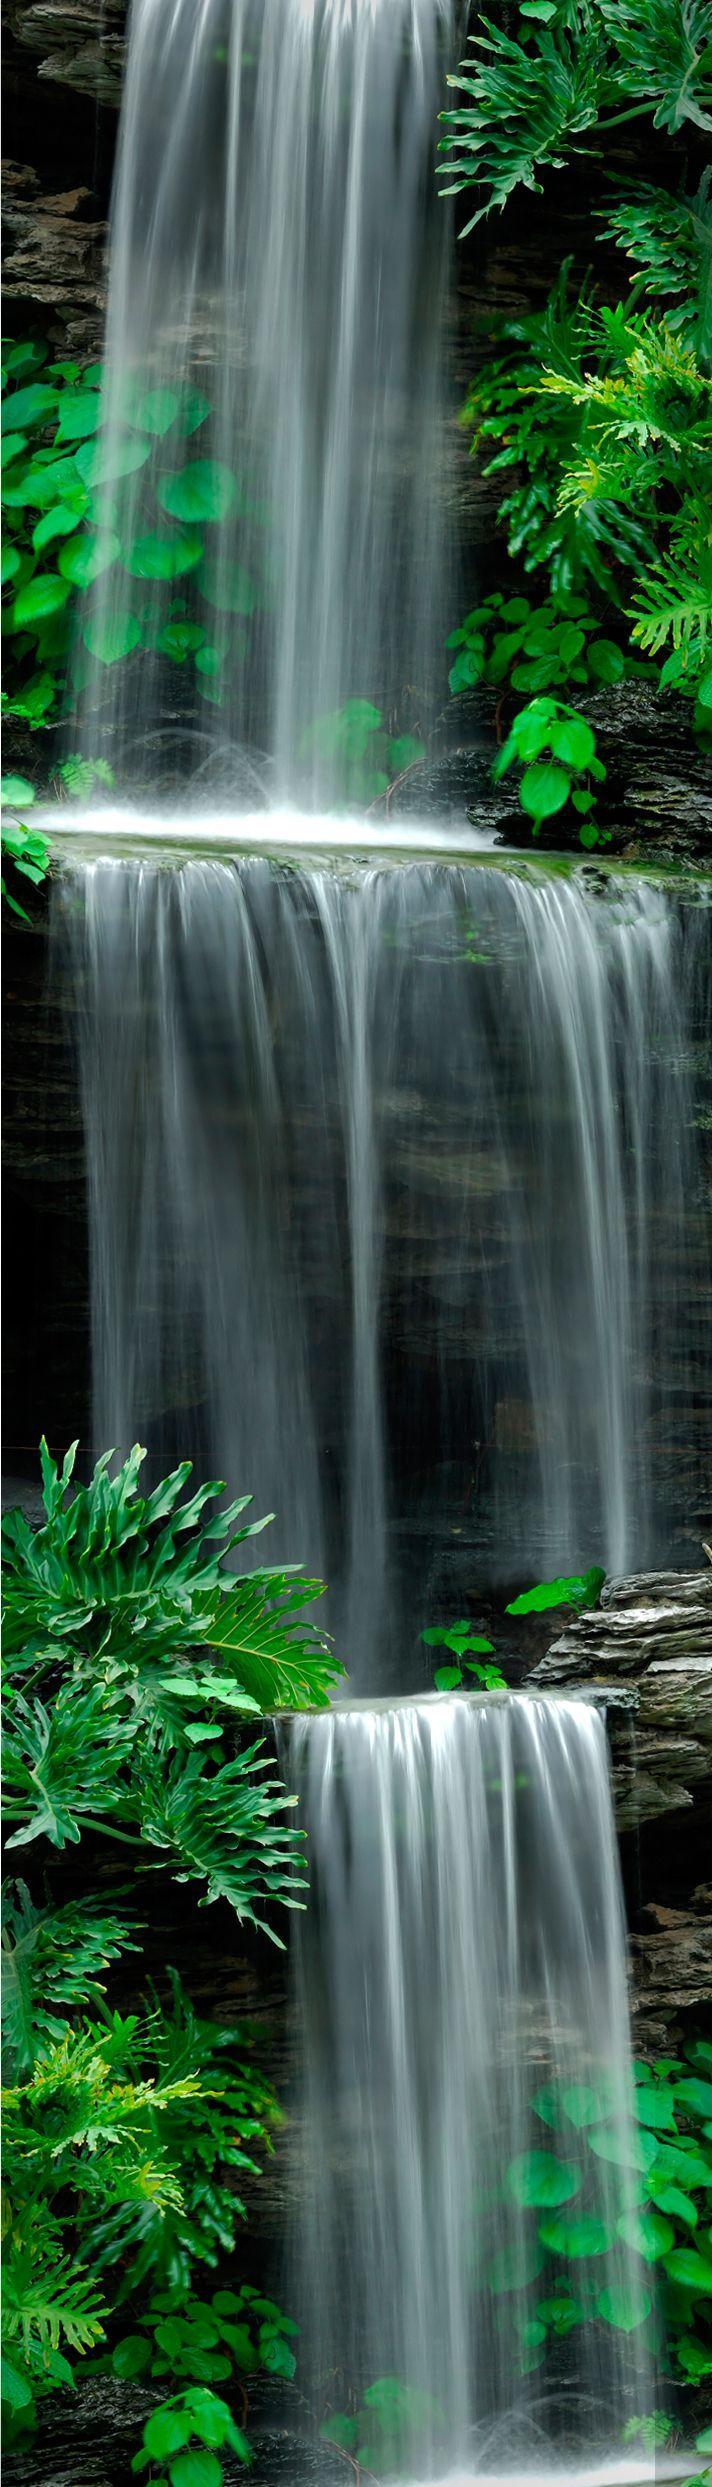 Graham Brown Cascade Stone Waterfall Wallpaper Diy And